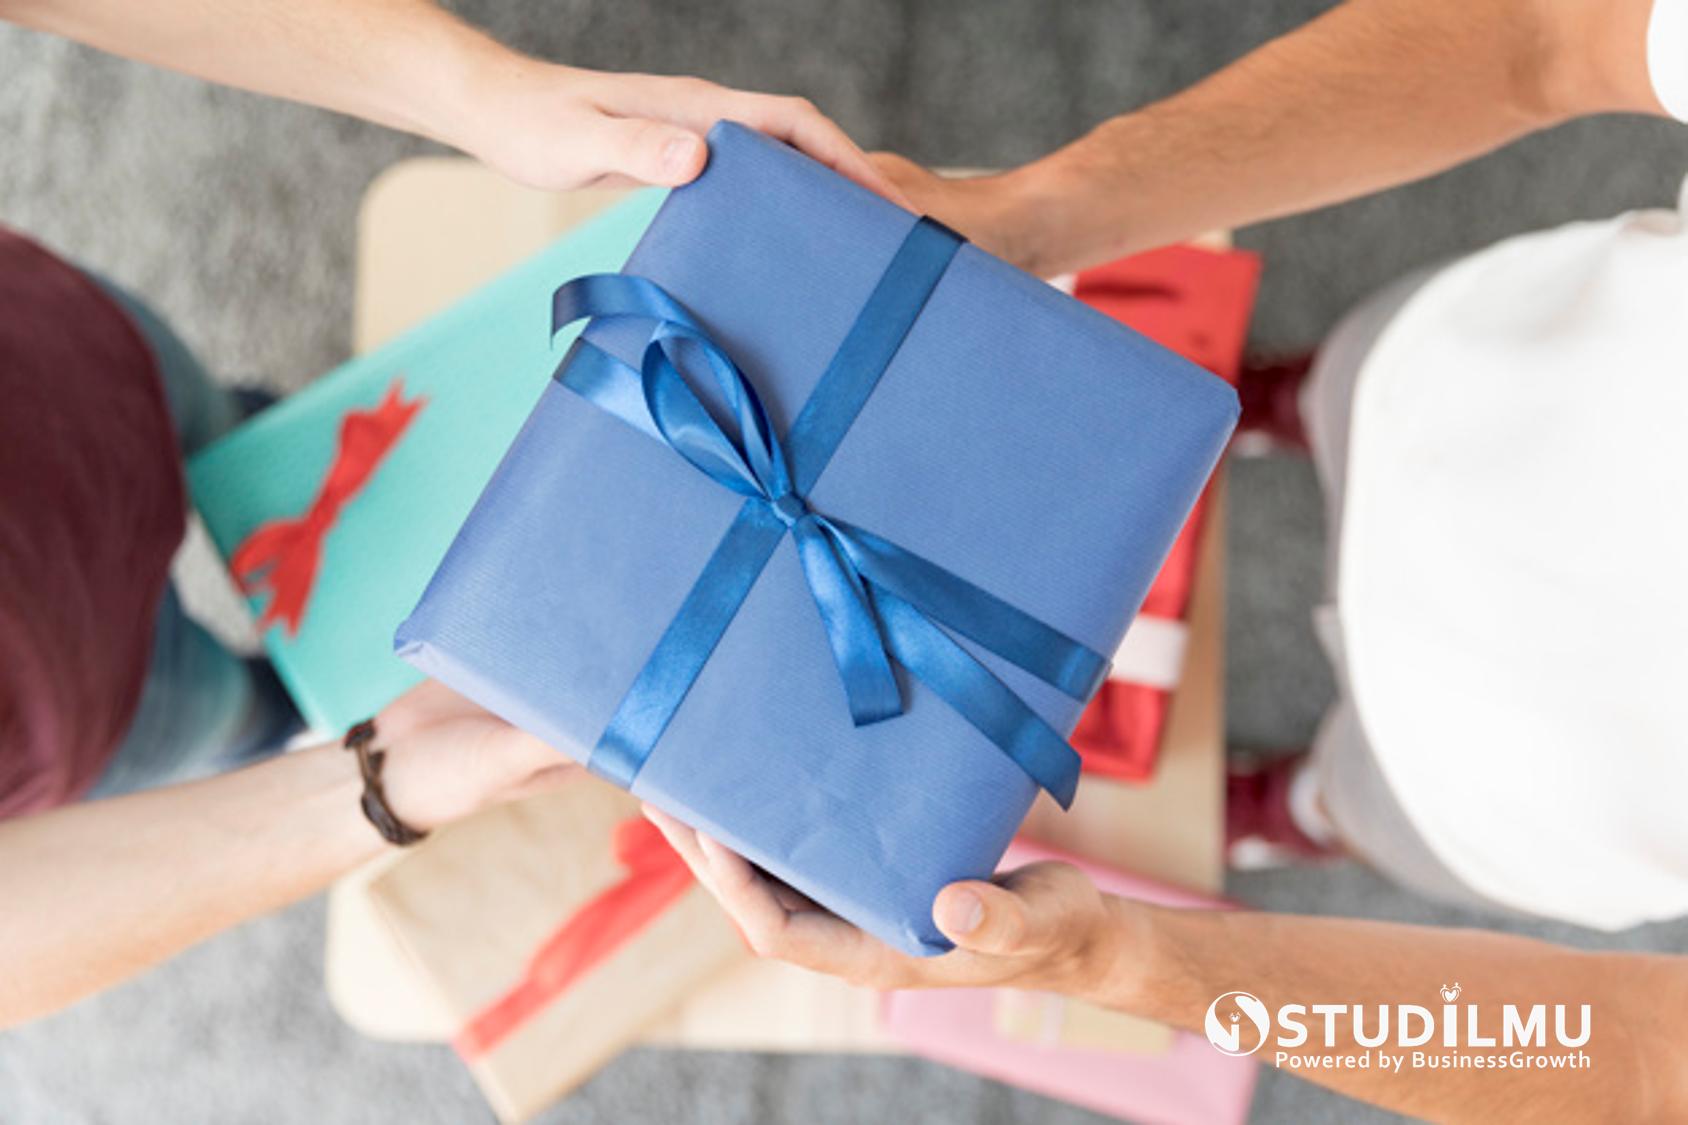 STUDILMU Career Advice - 20 Cara Baru untuk Memberi Hadiah kepada Karyawan